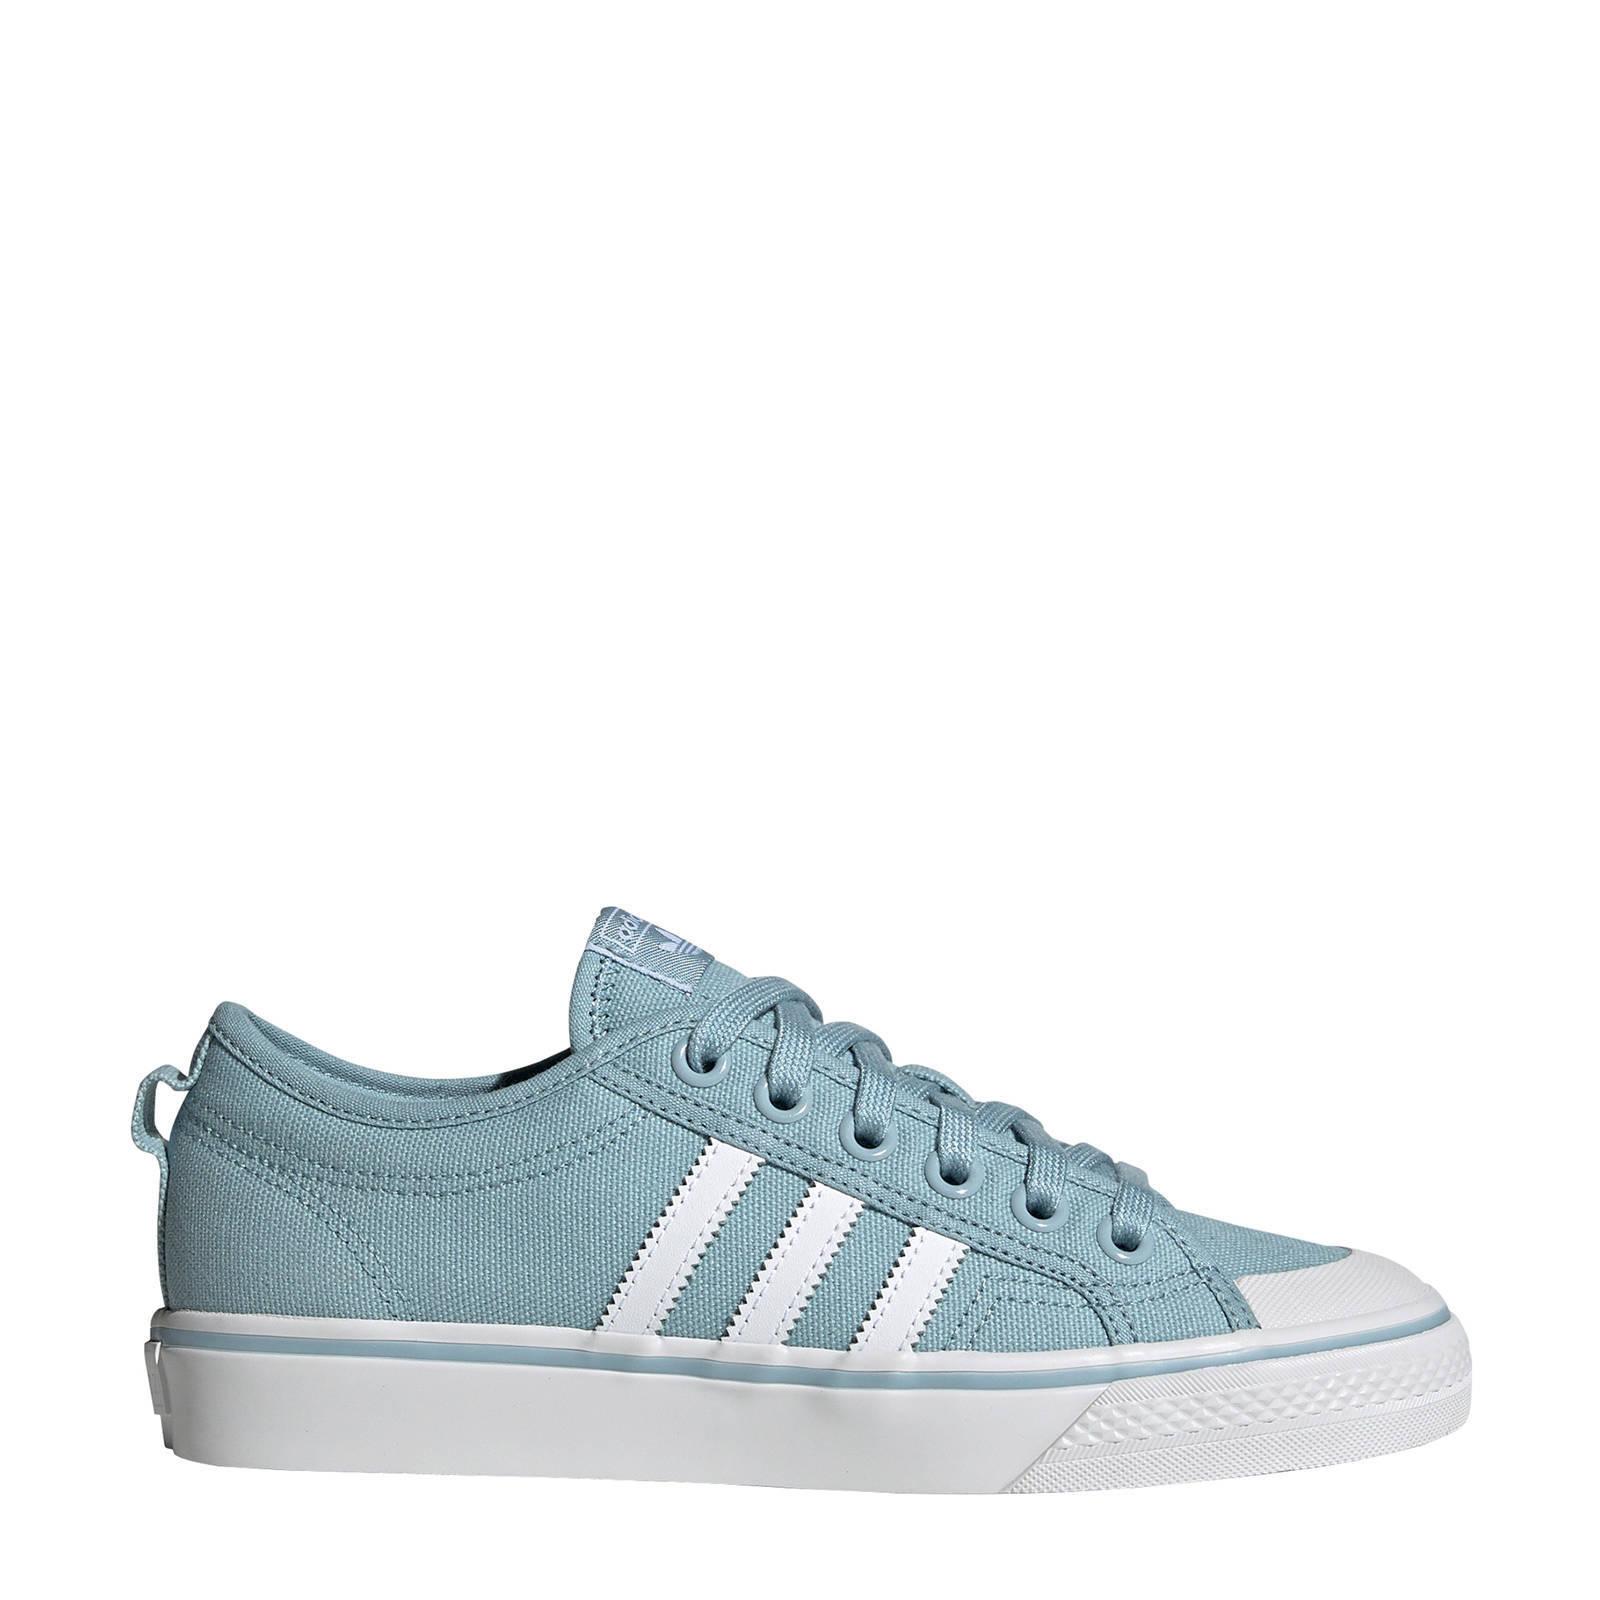 adidas Originals Nizza W sneakers lichtblauw | wehkamp